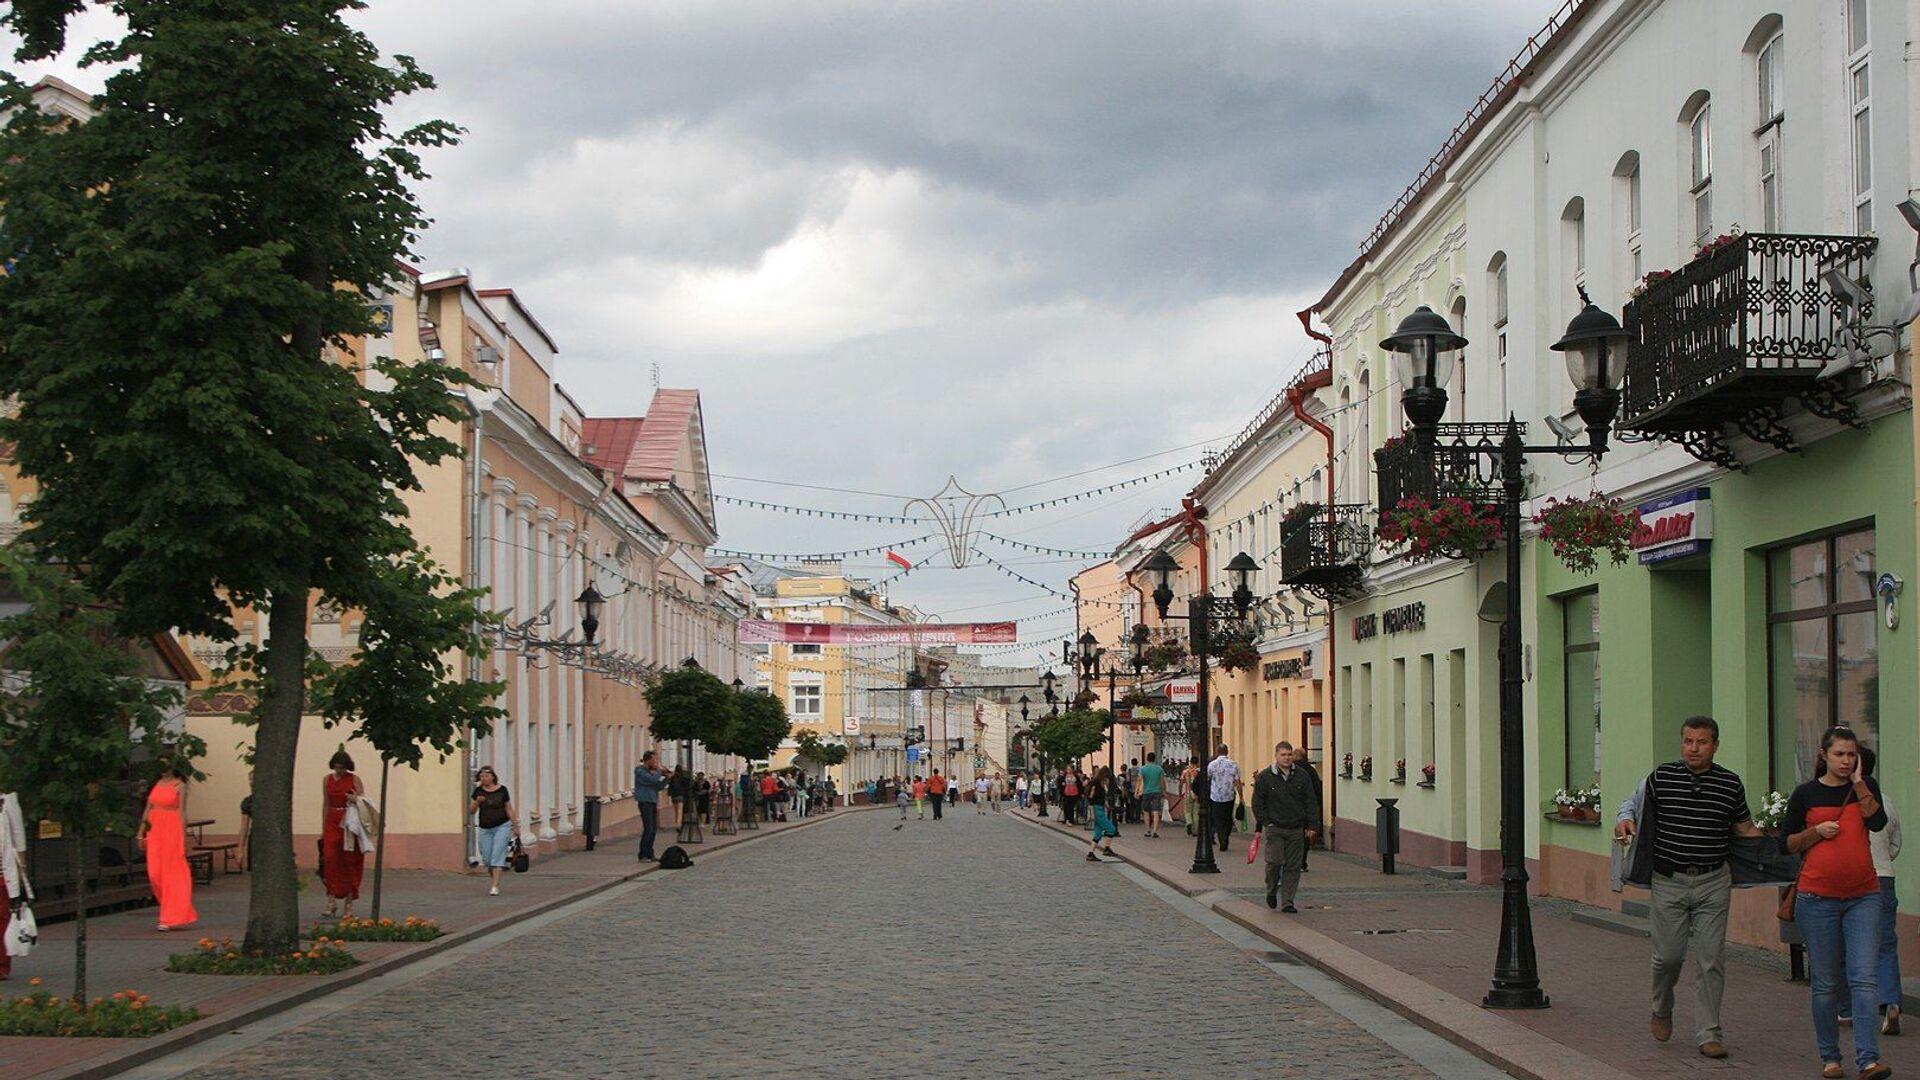 Grodno, Białoruś - Sputnik Polska, 1920, 14.04.2021